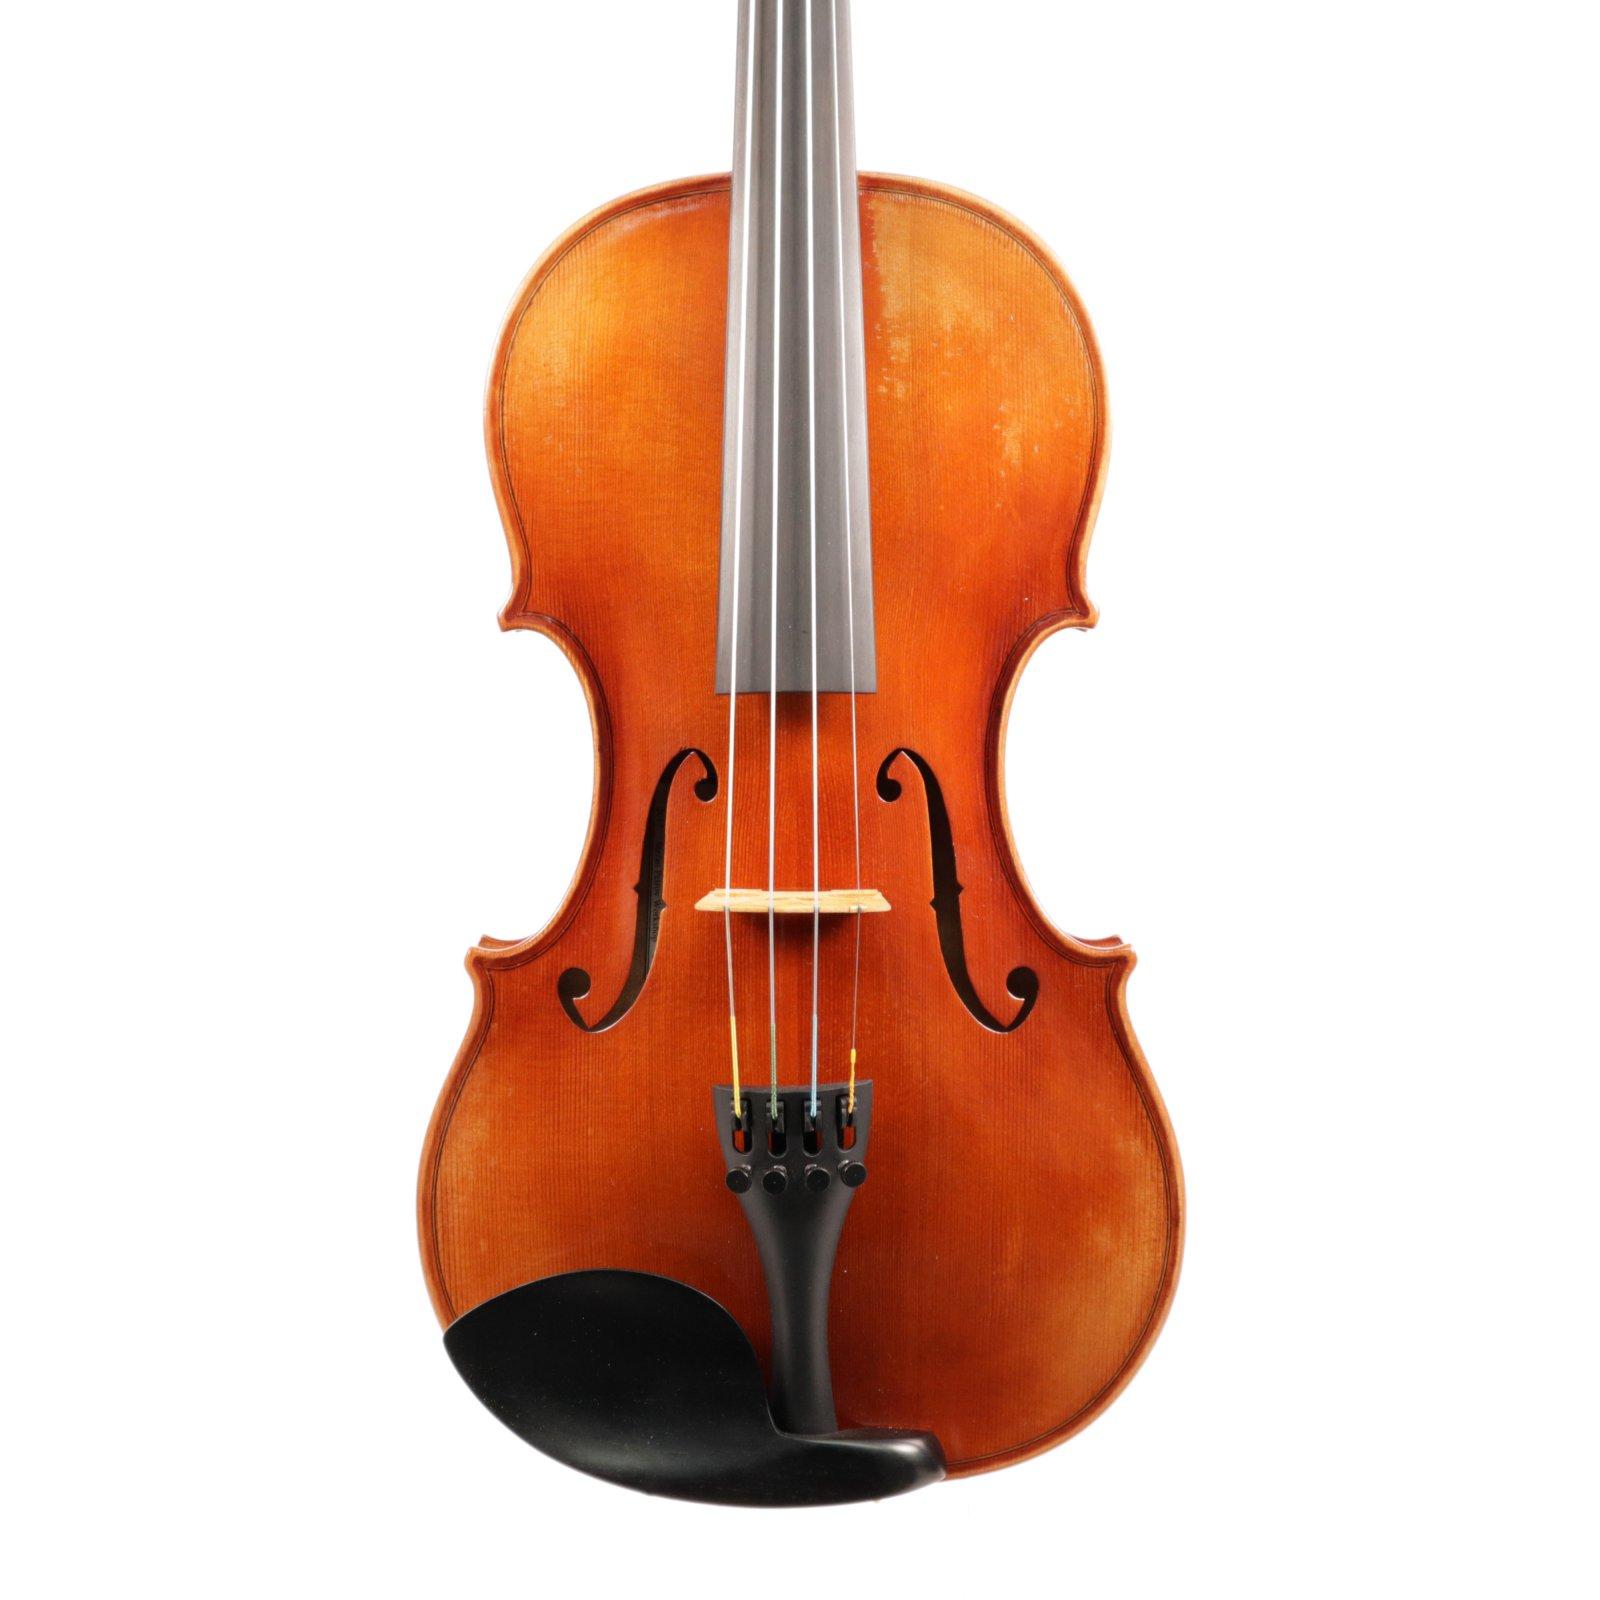 Petrov Trista 2017 Violin #1265